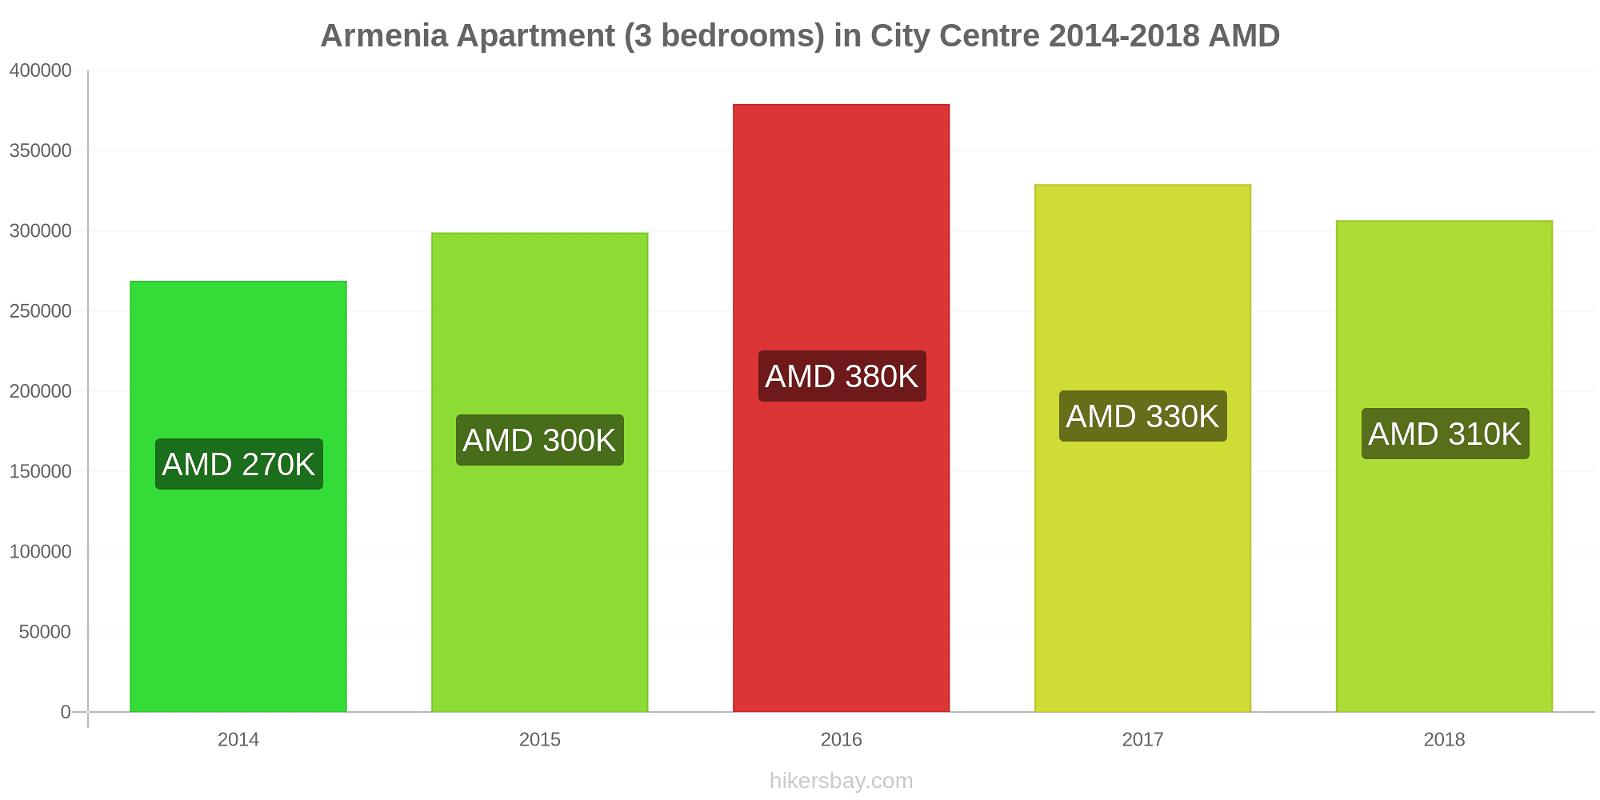 Armenia price changes Apartment (3 bedrooms) in City Centre hikersbay.com